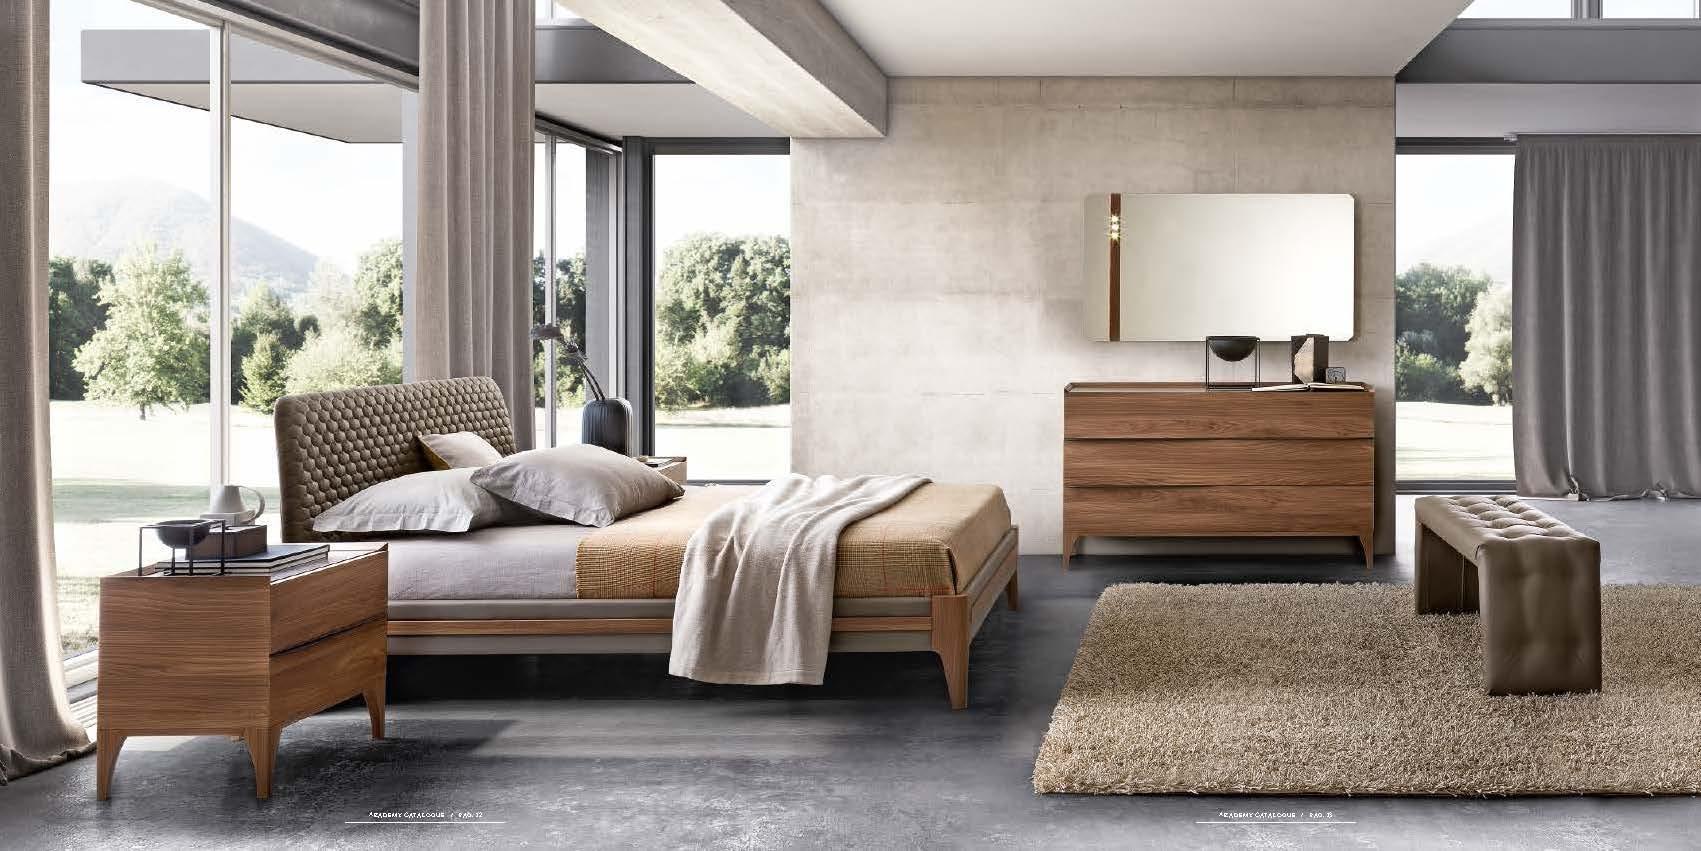 Interior design with elevated furniture pieces